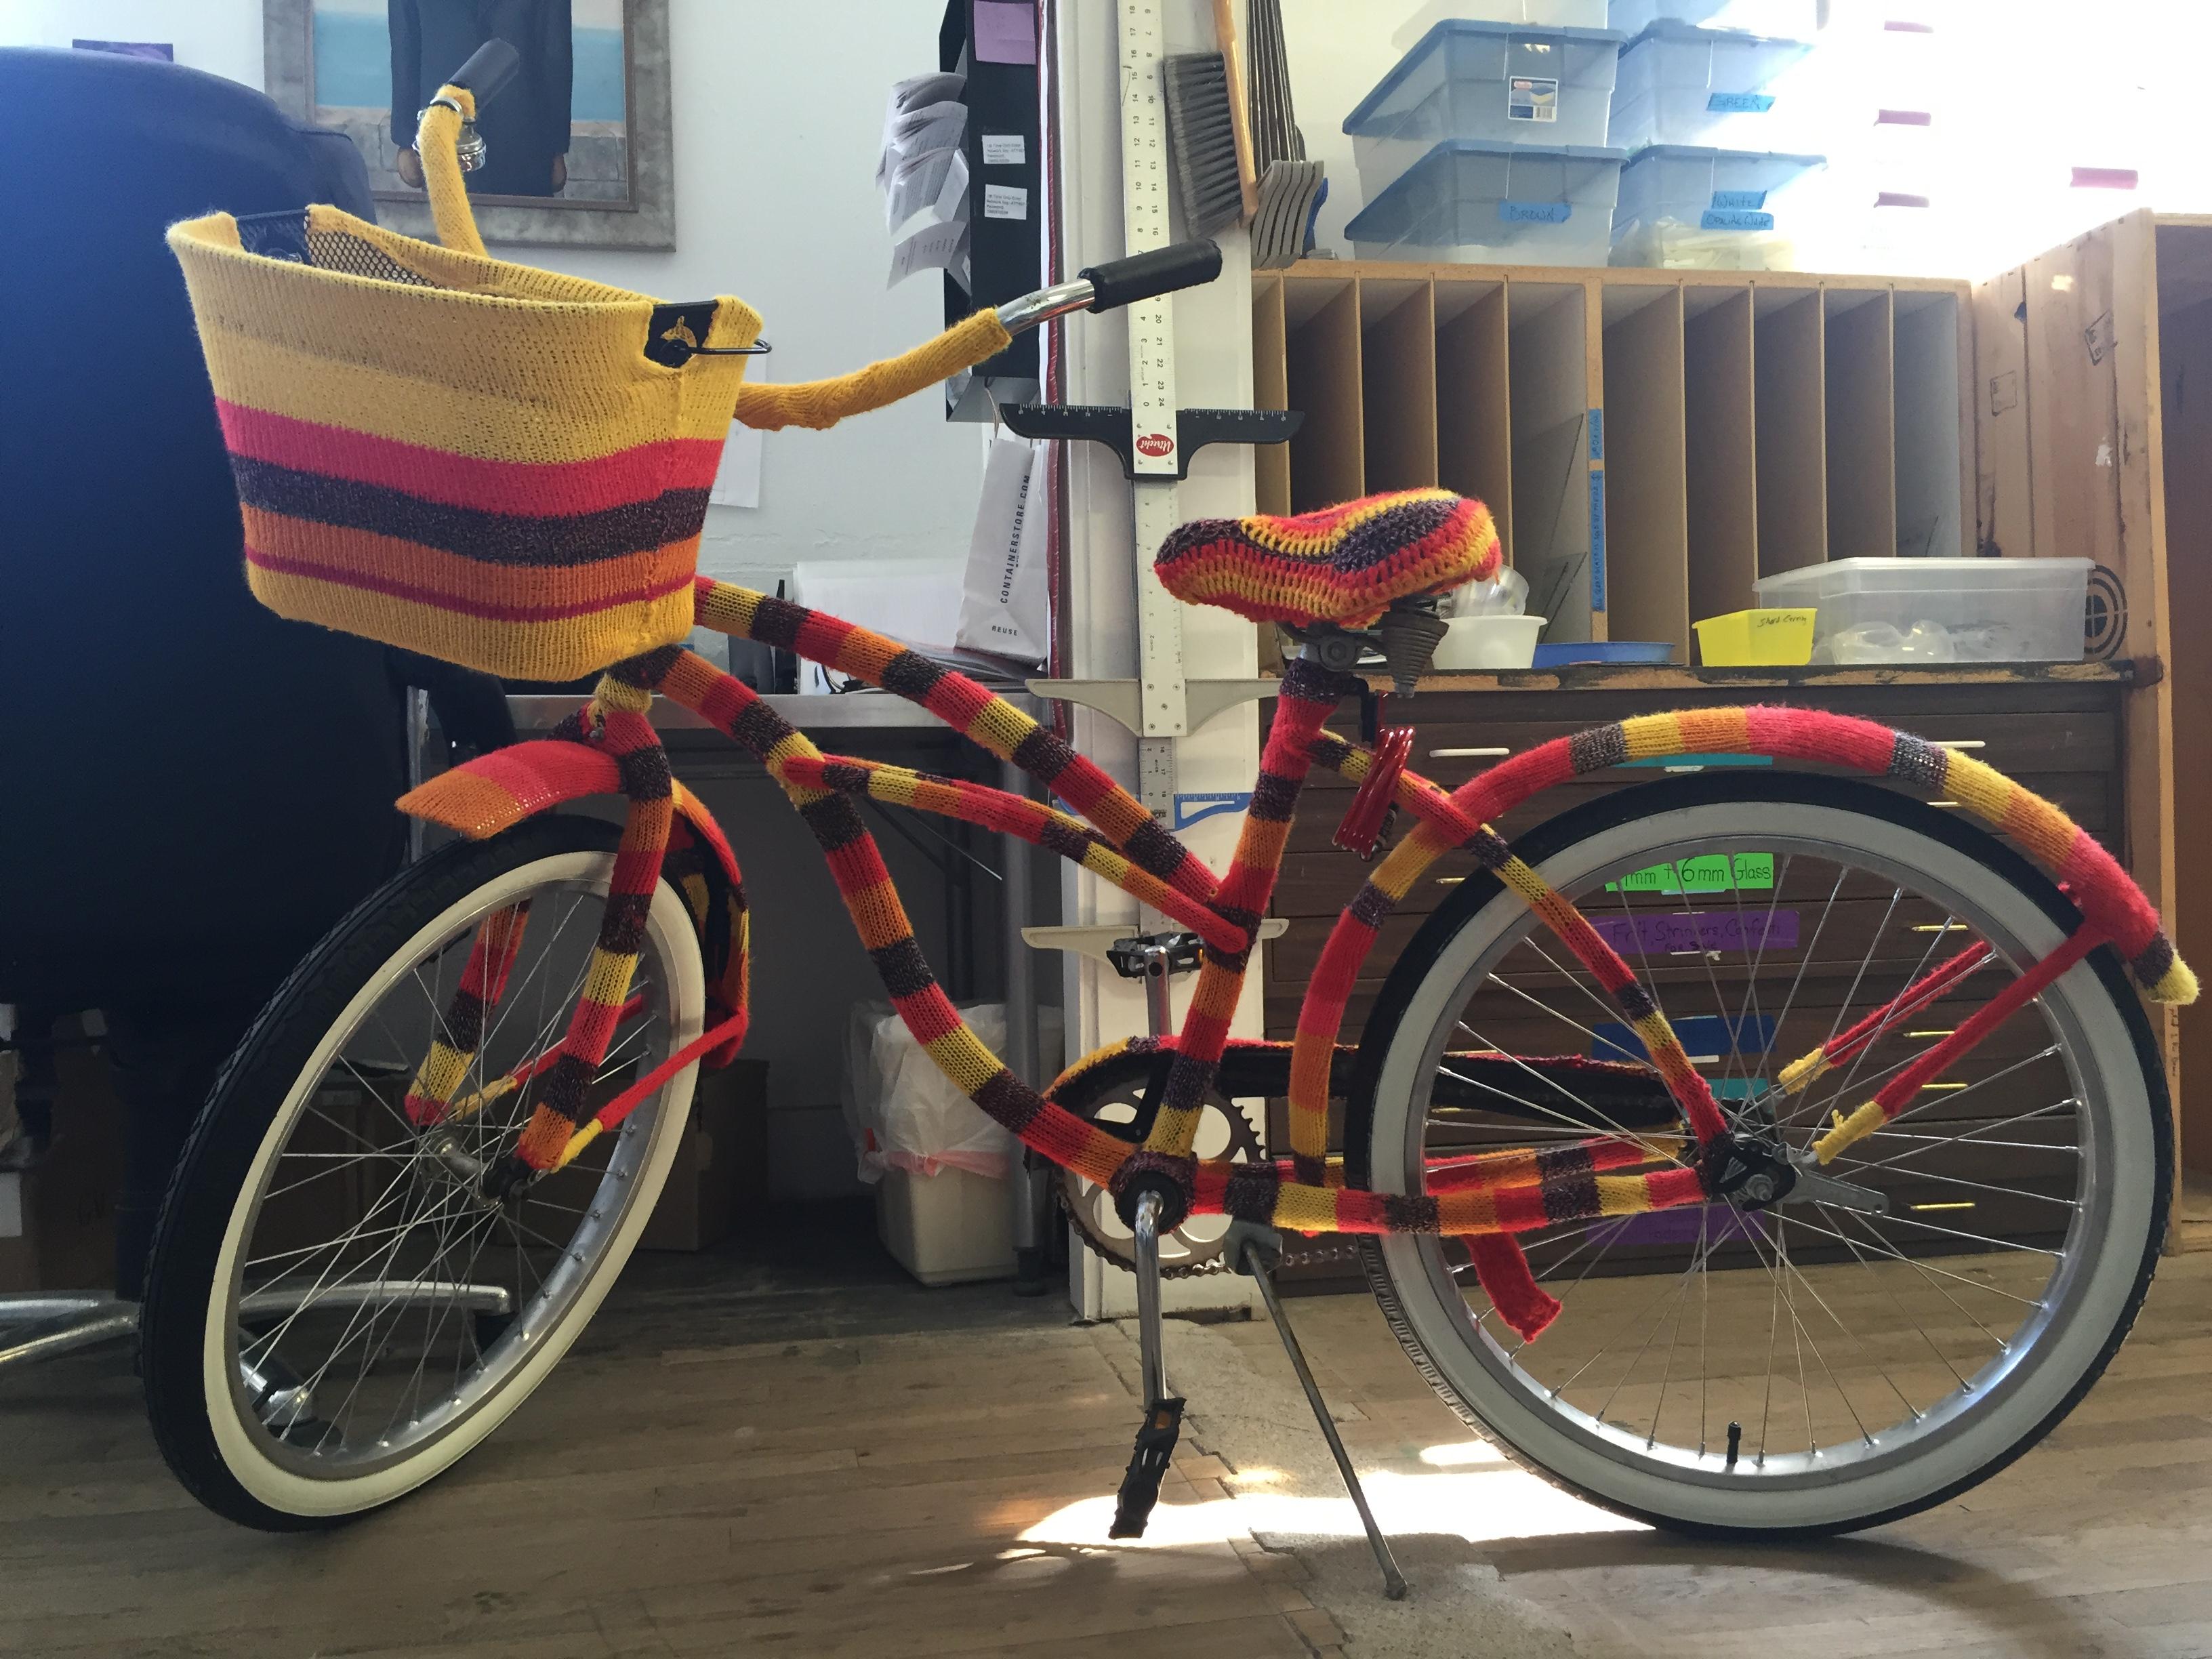 Yarn-bombed bike, Creative Arts Center of Dallas.